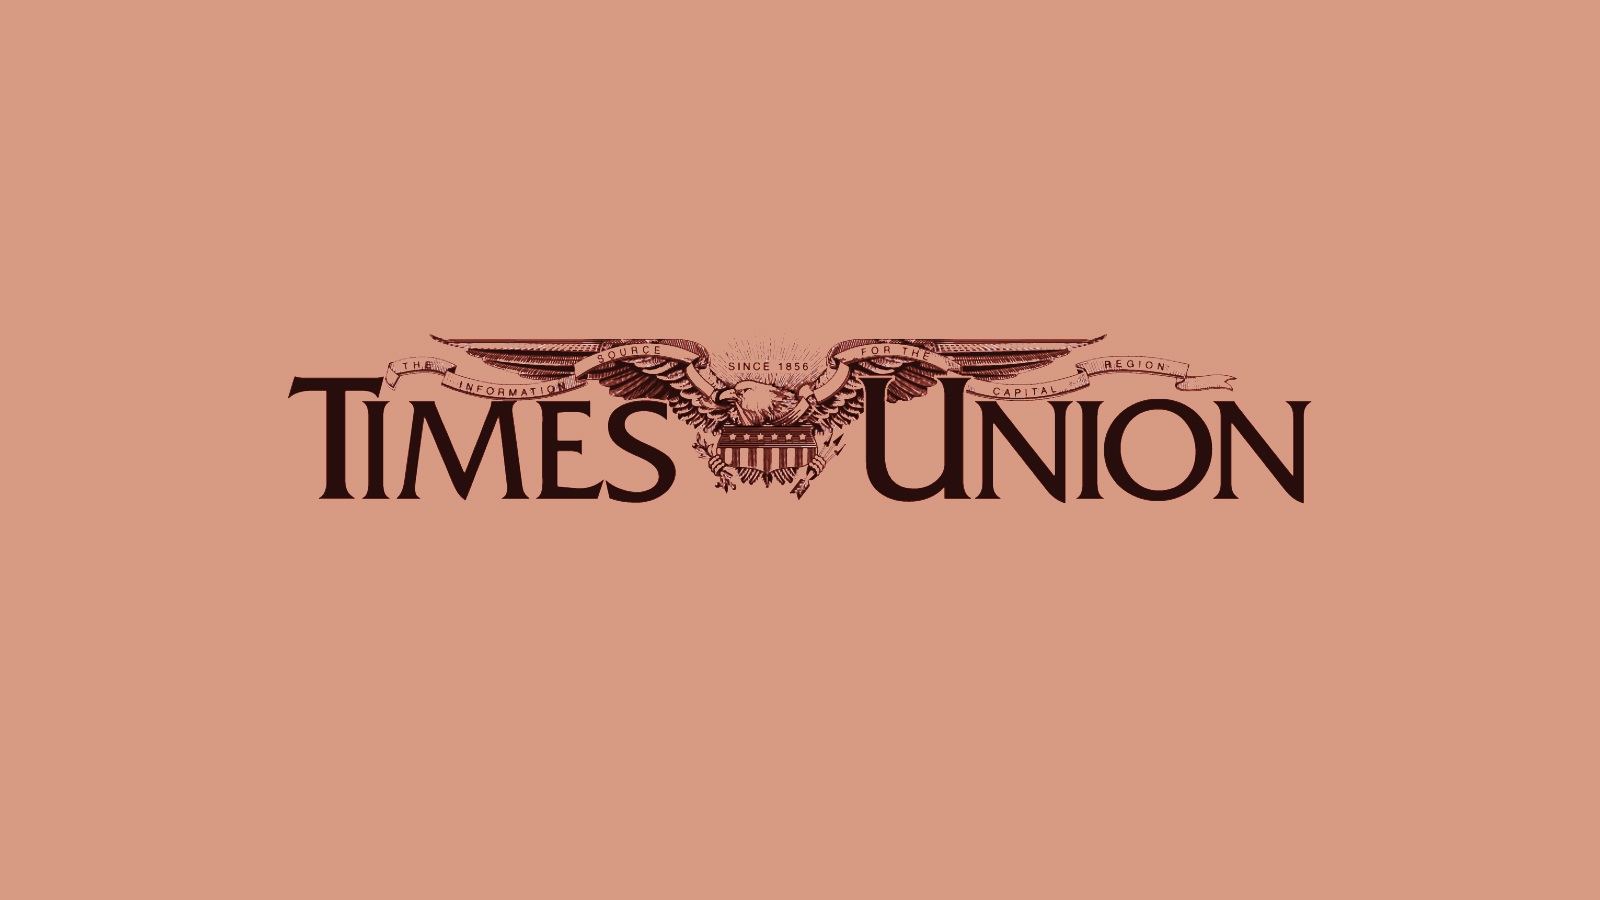 TimesUnion